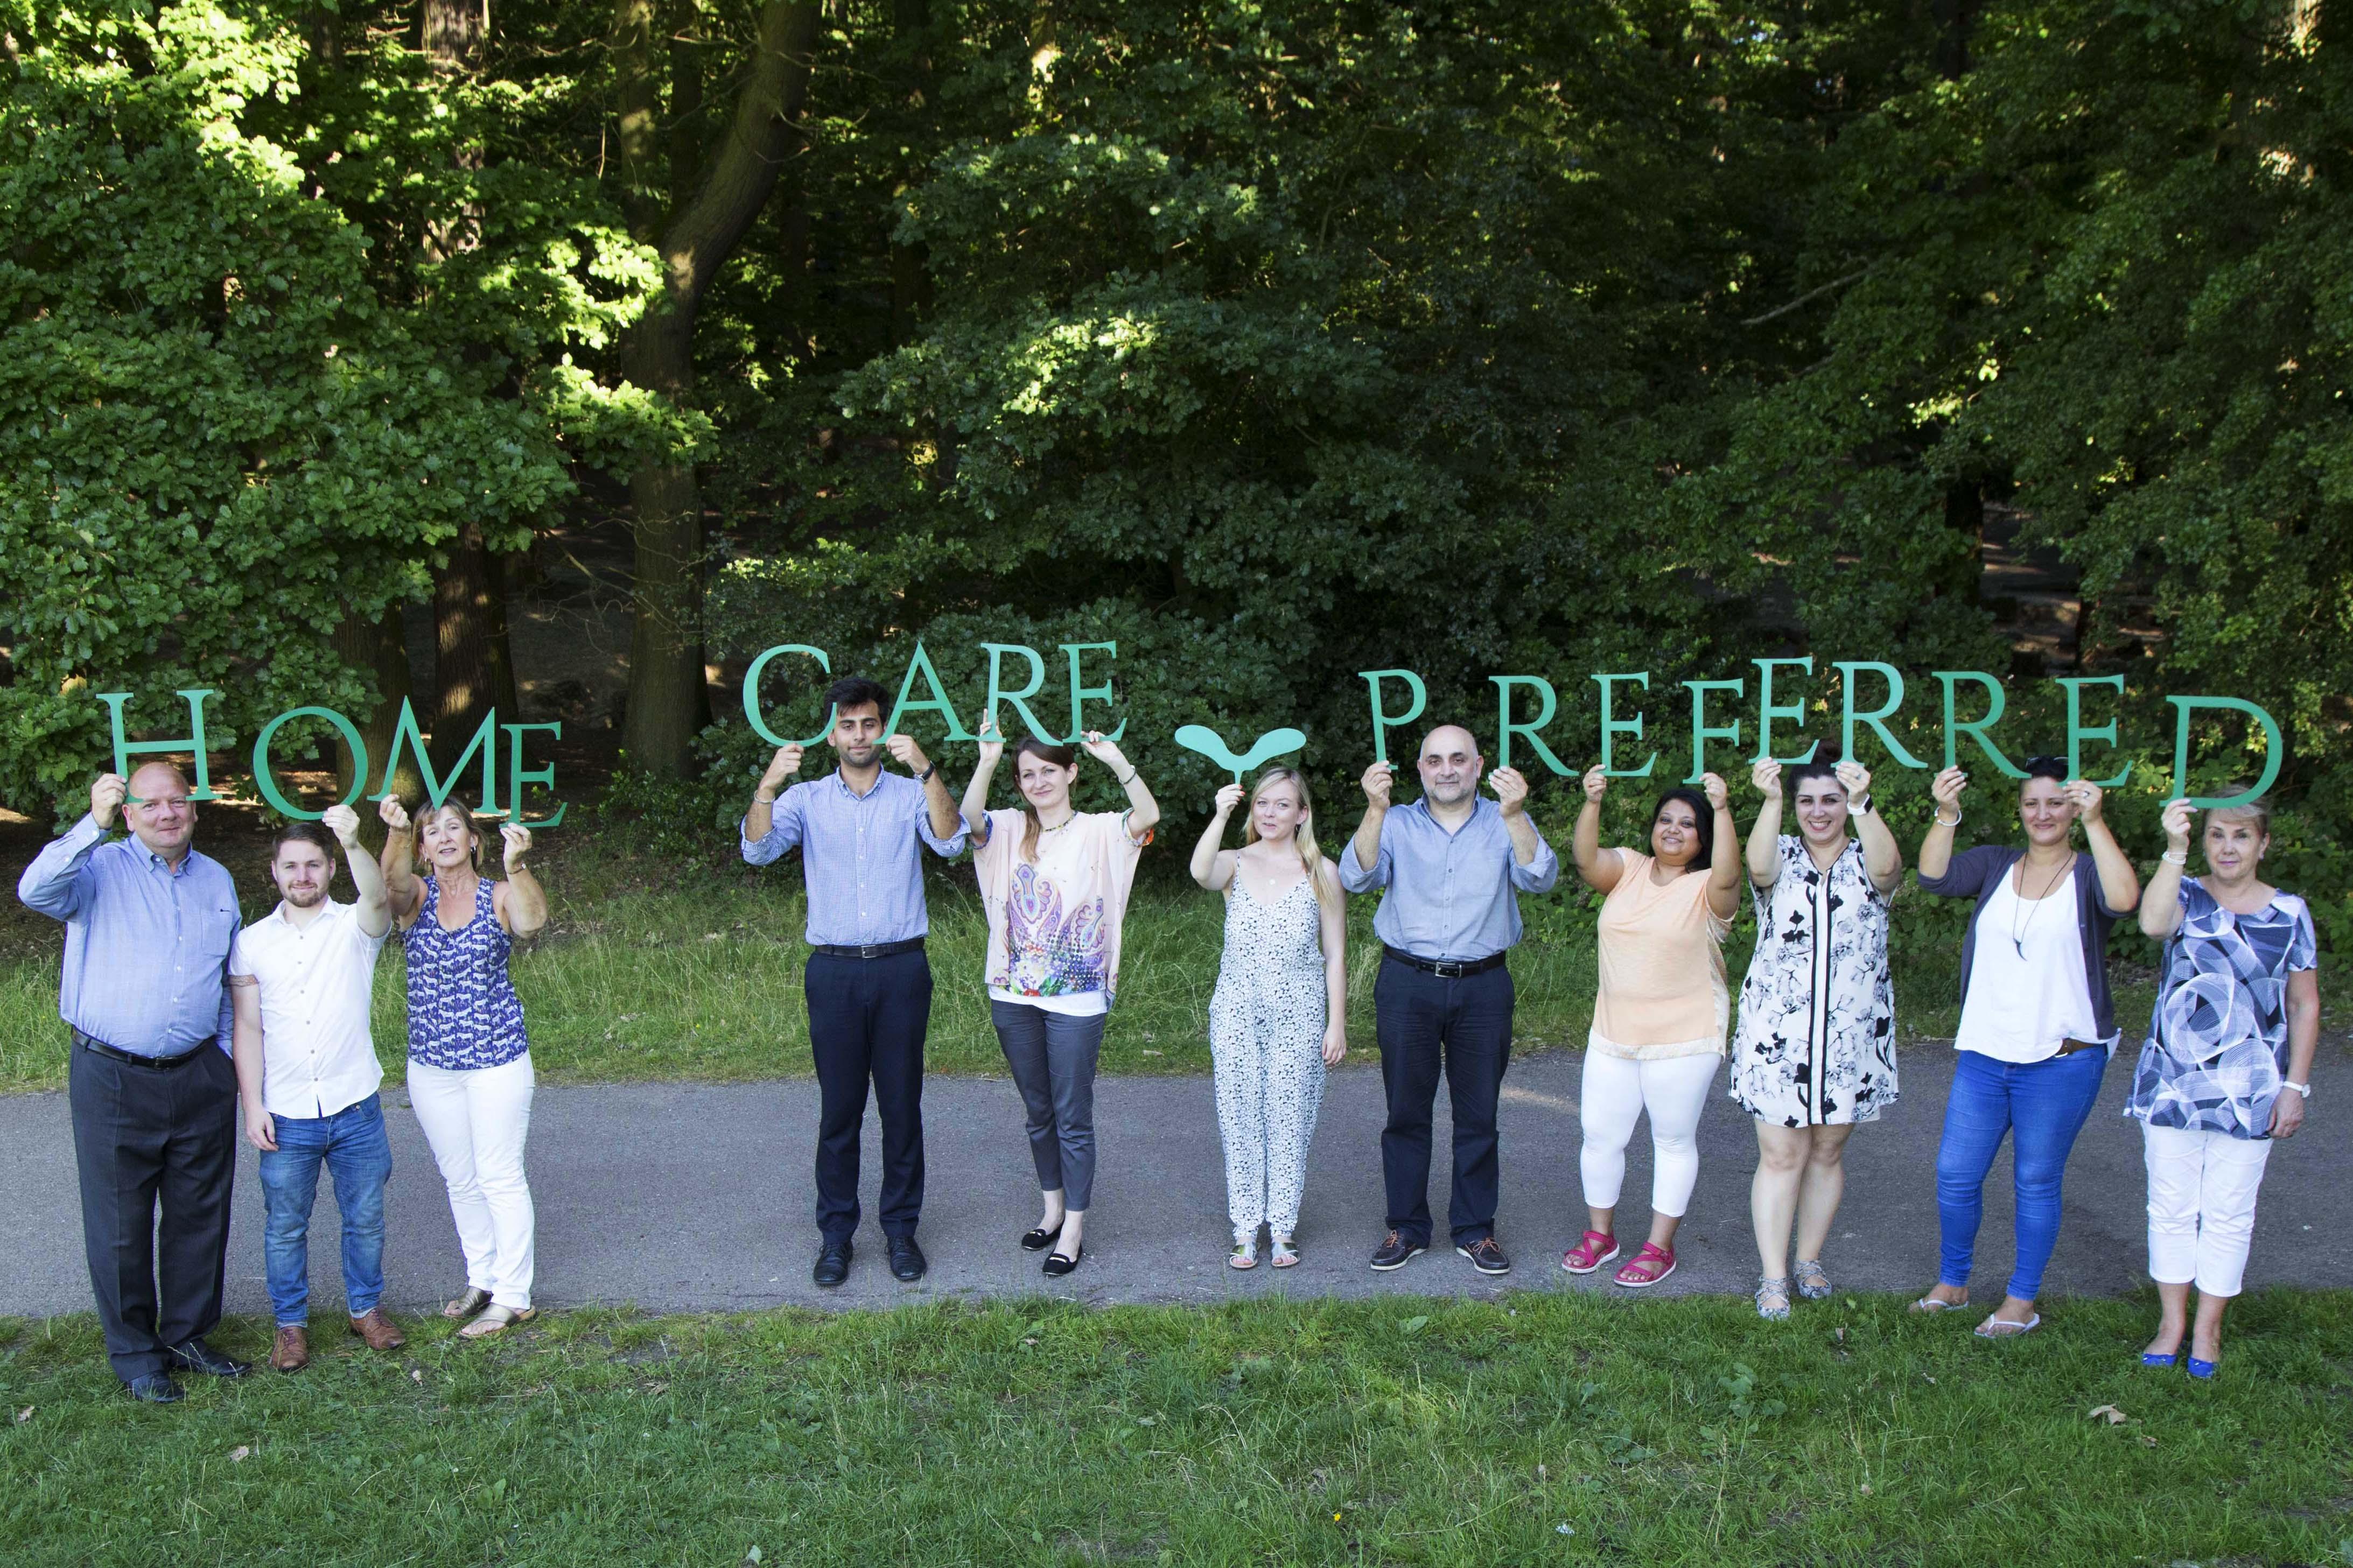 Home Care Preferred Team